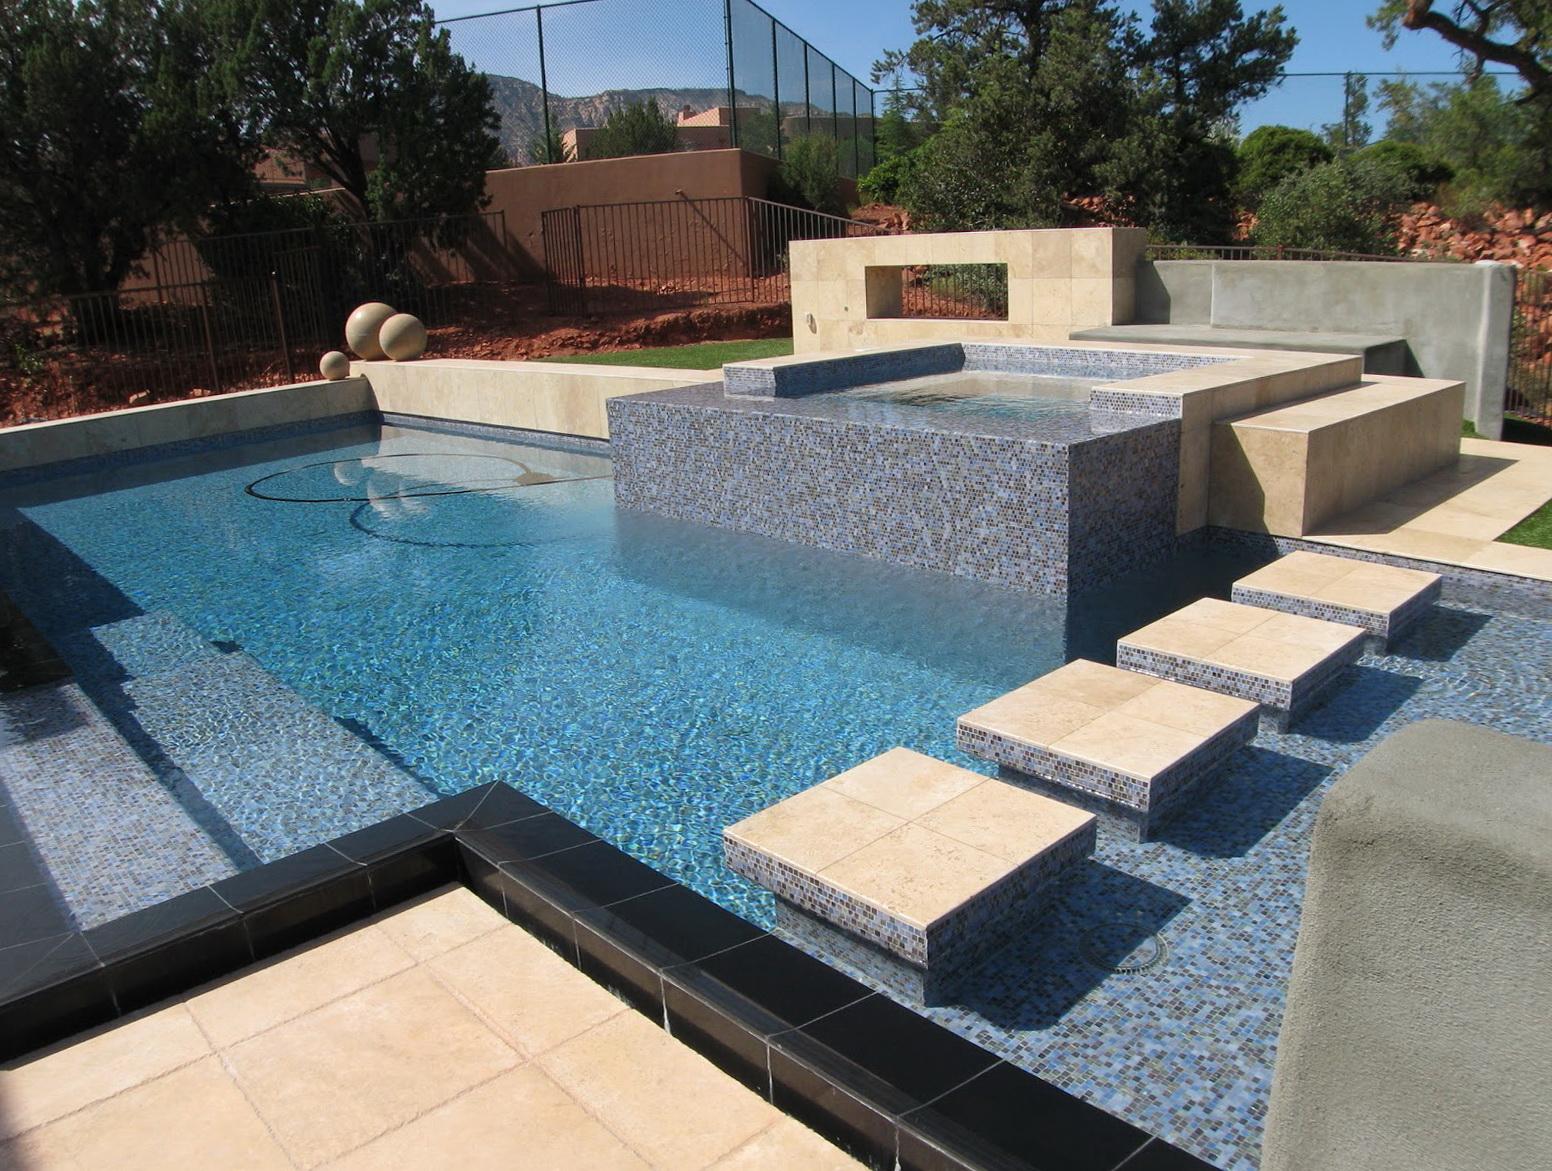 Silver Travertine Pool Deck Home Design Ideas